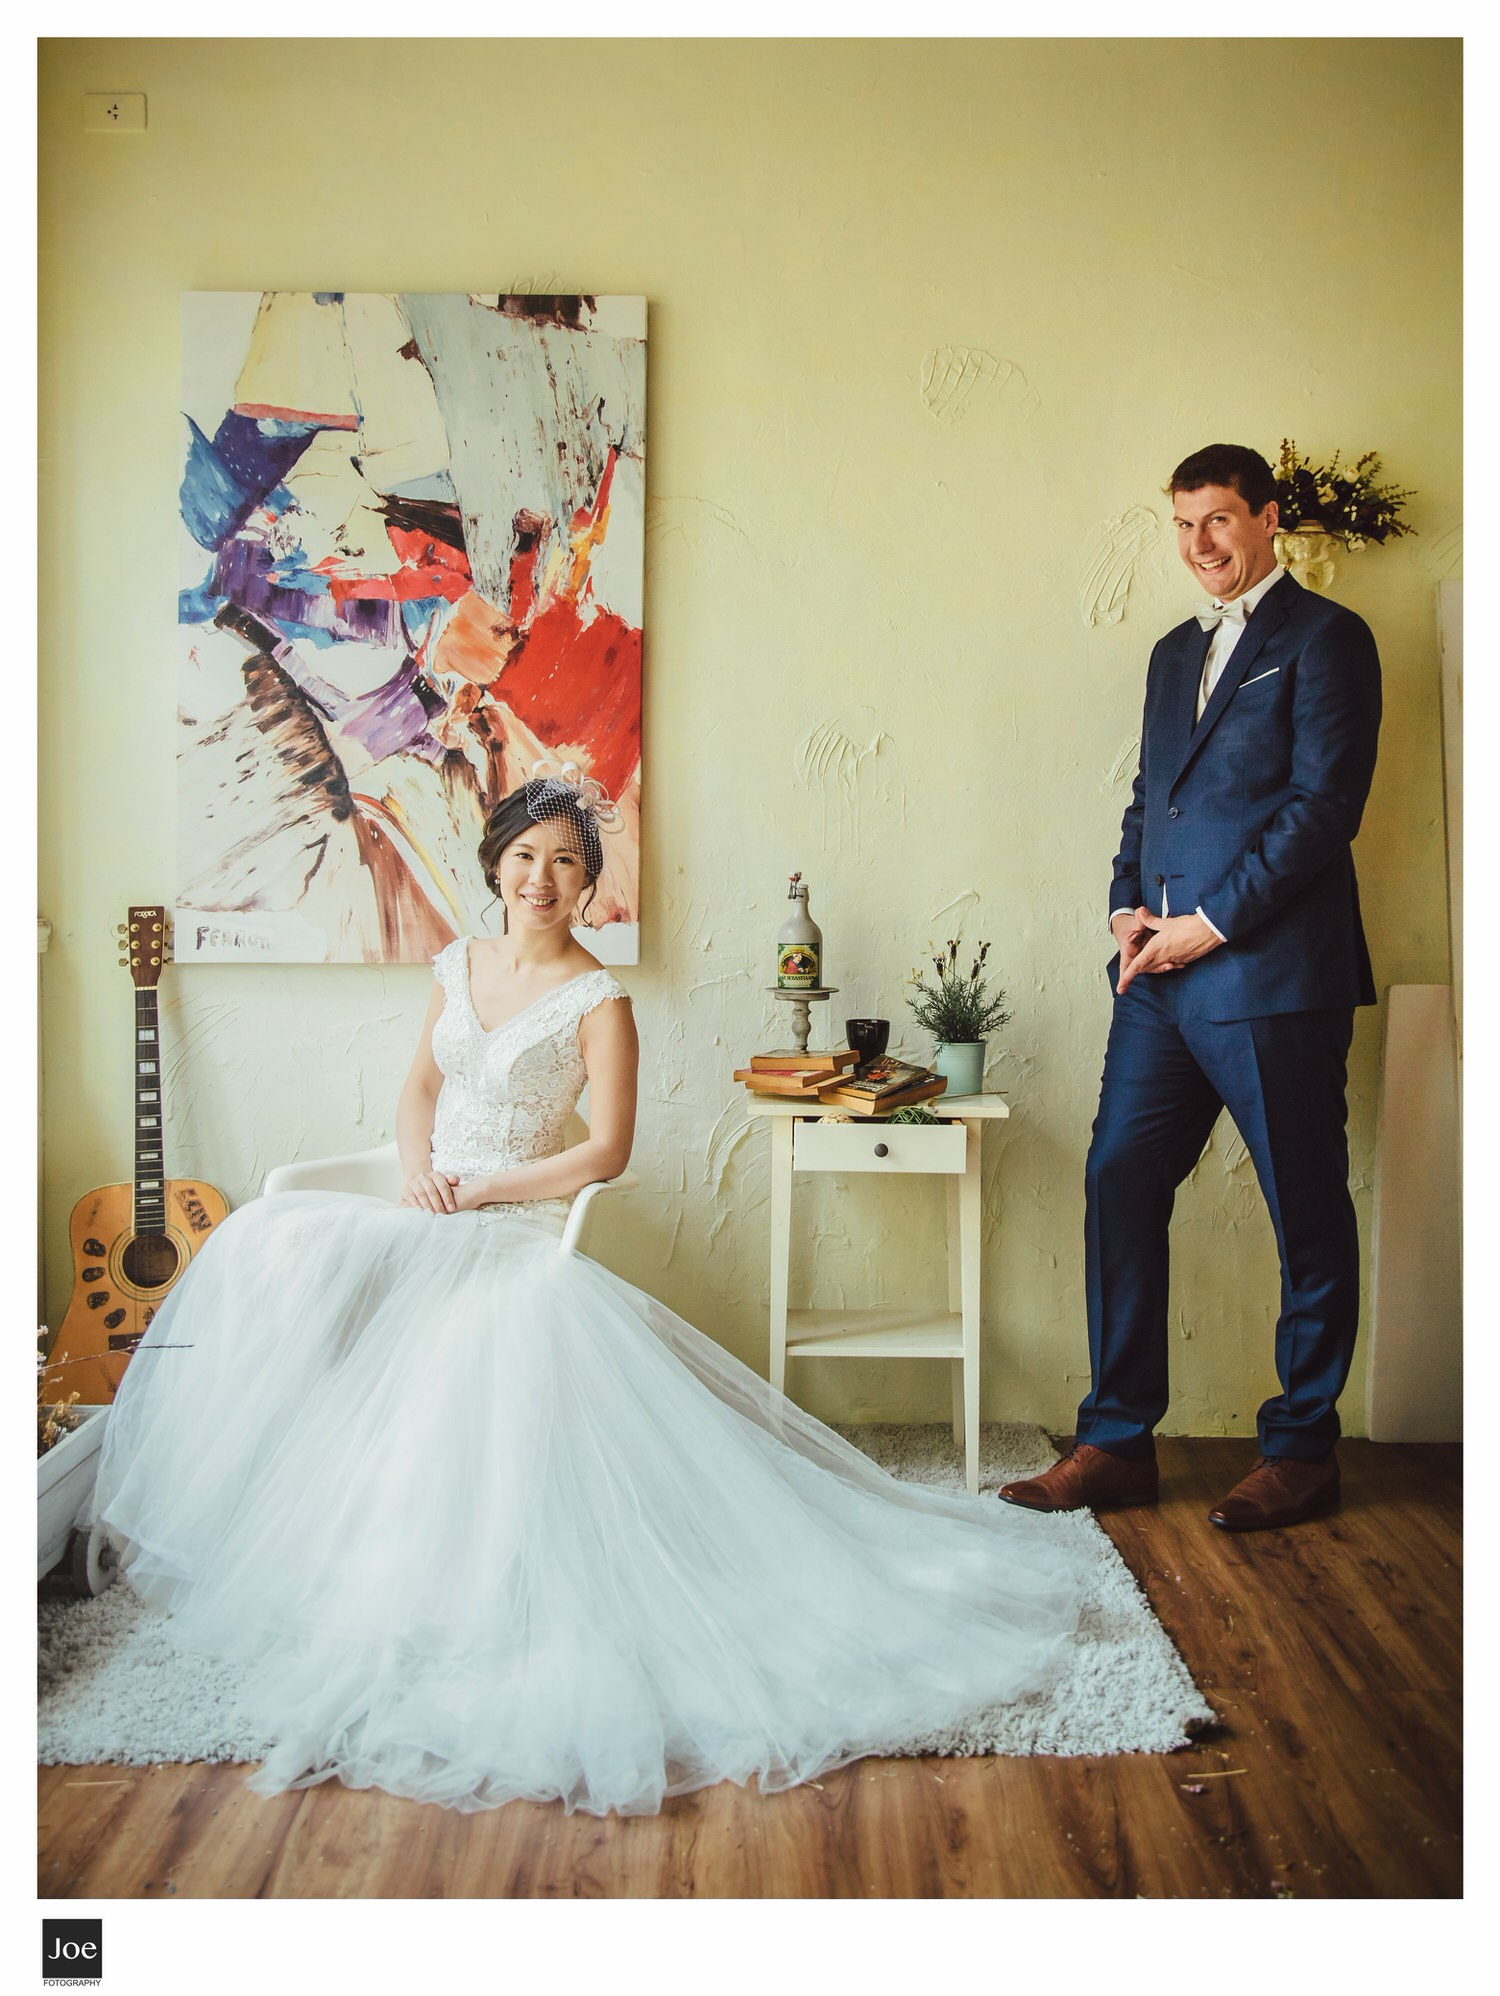 joe-fotography-pre-wedding-kay-jeff-007.jpg